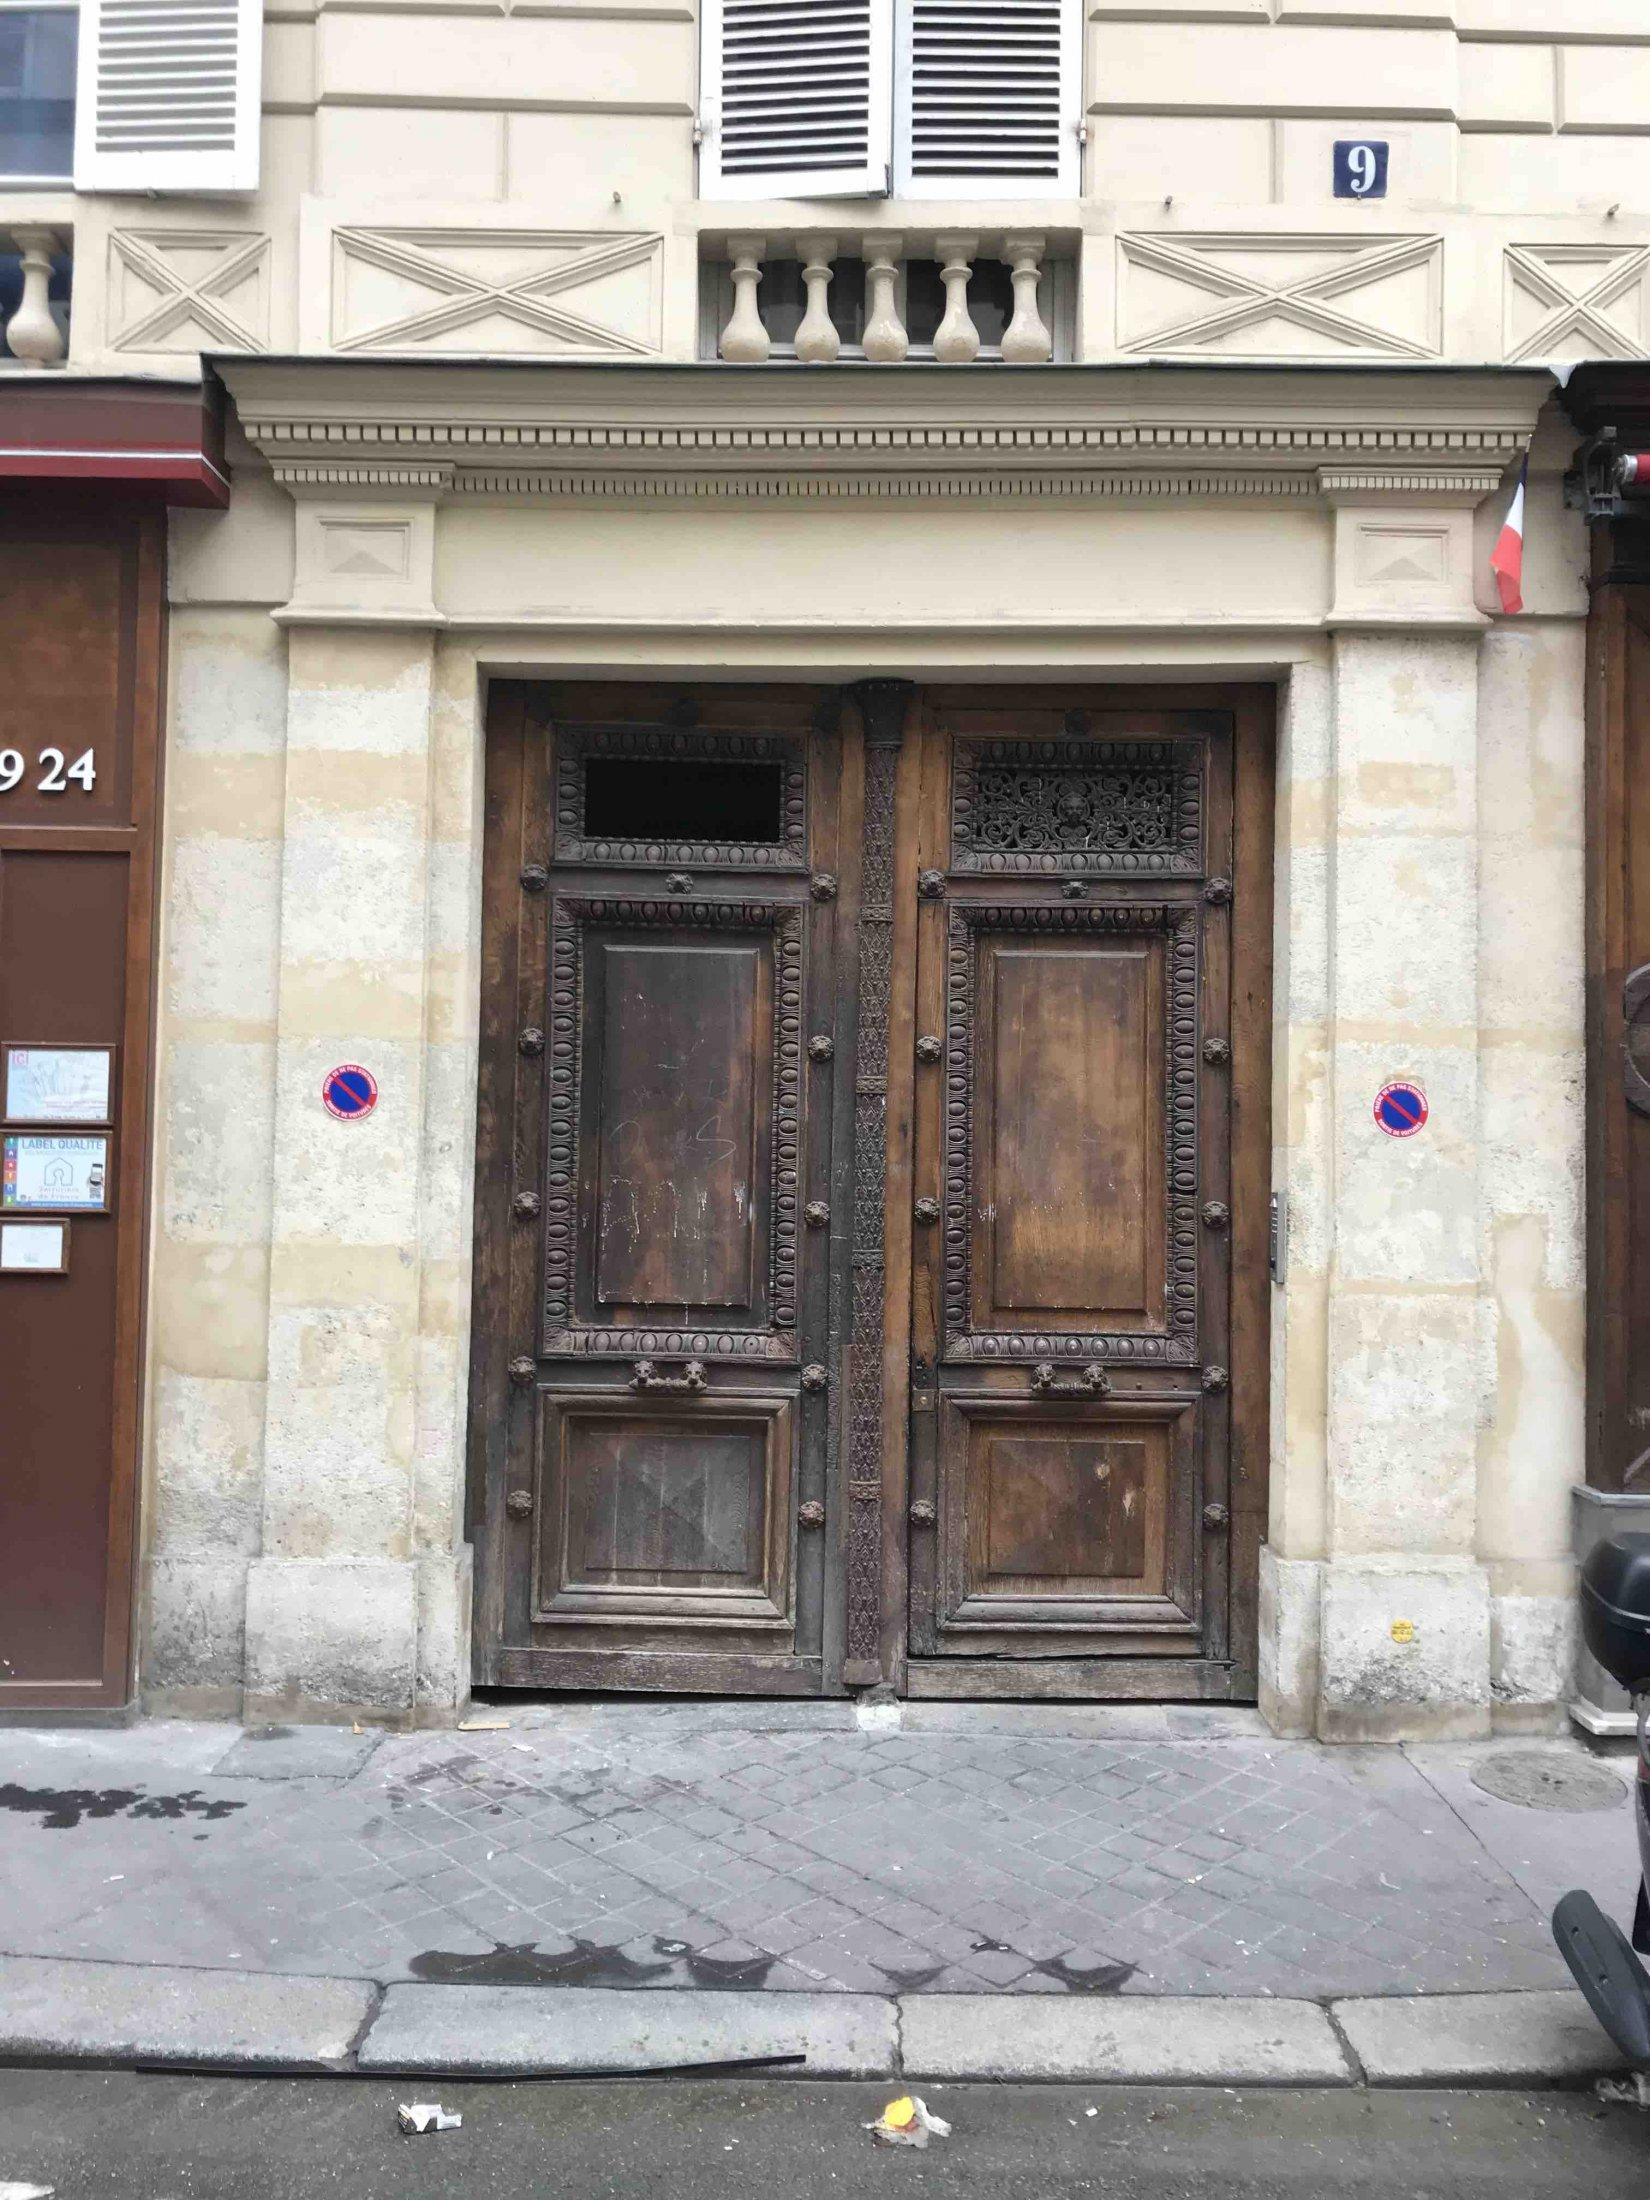 9 RUE DU GRAND PRIEURE PARIS 11